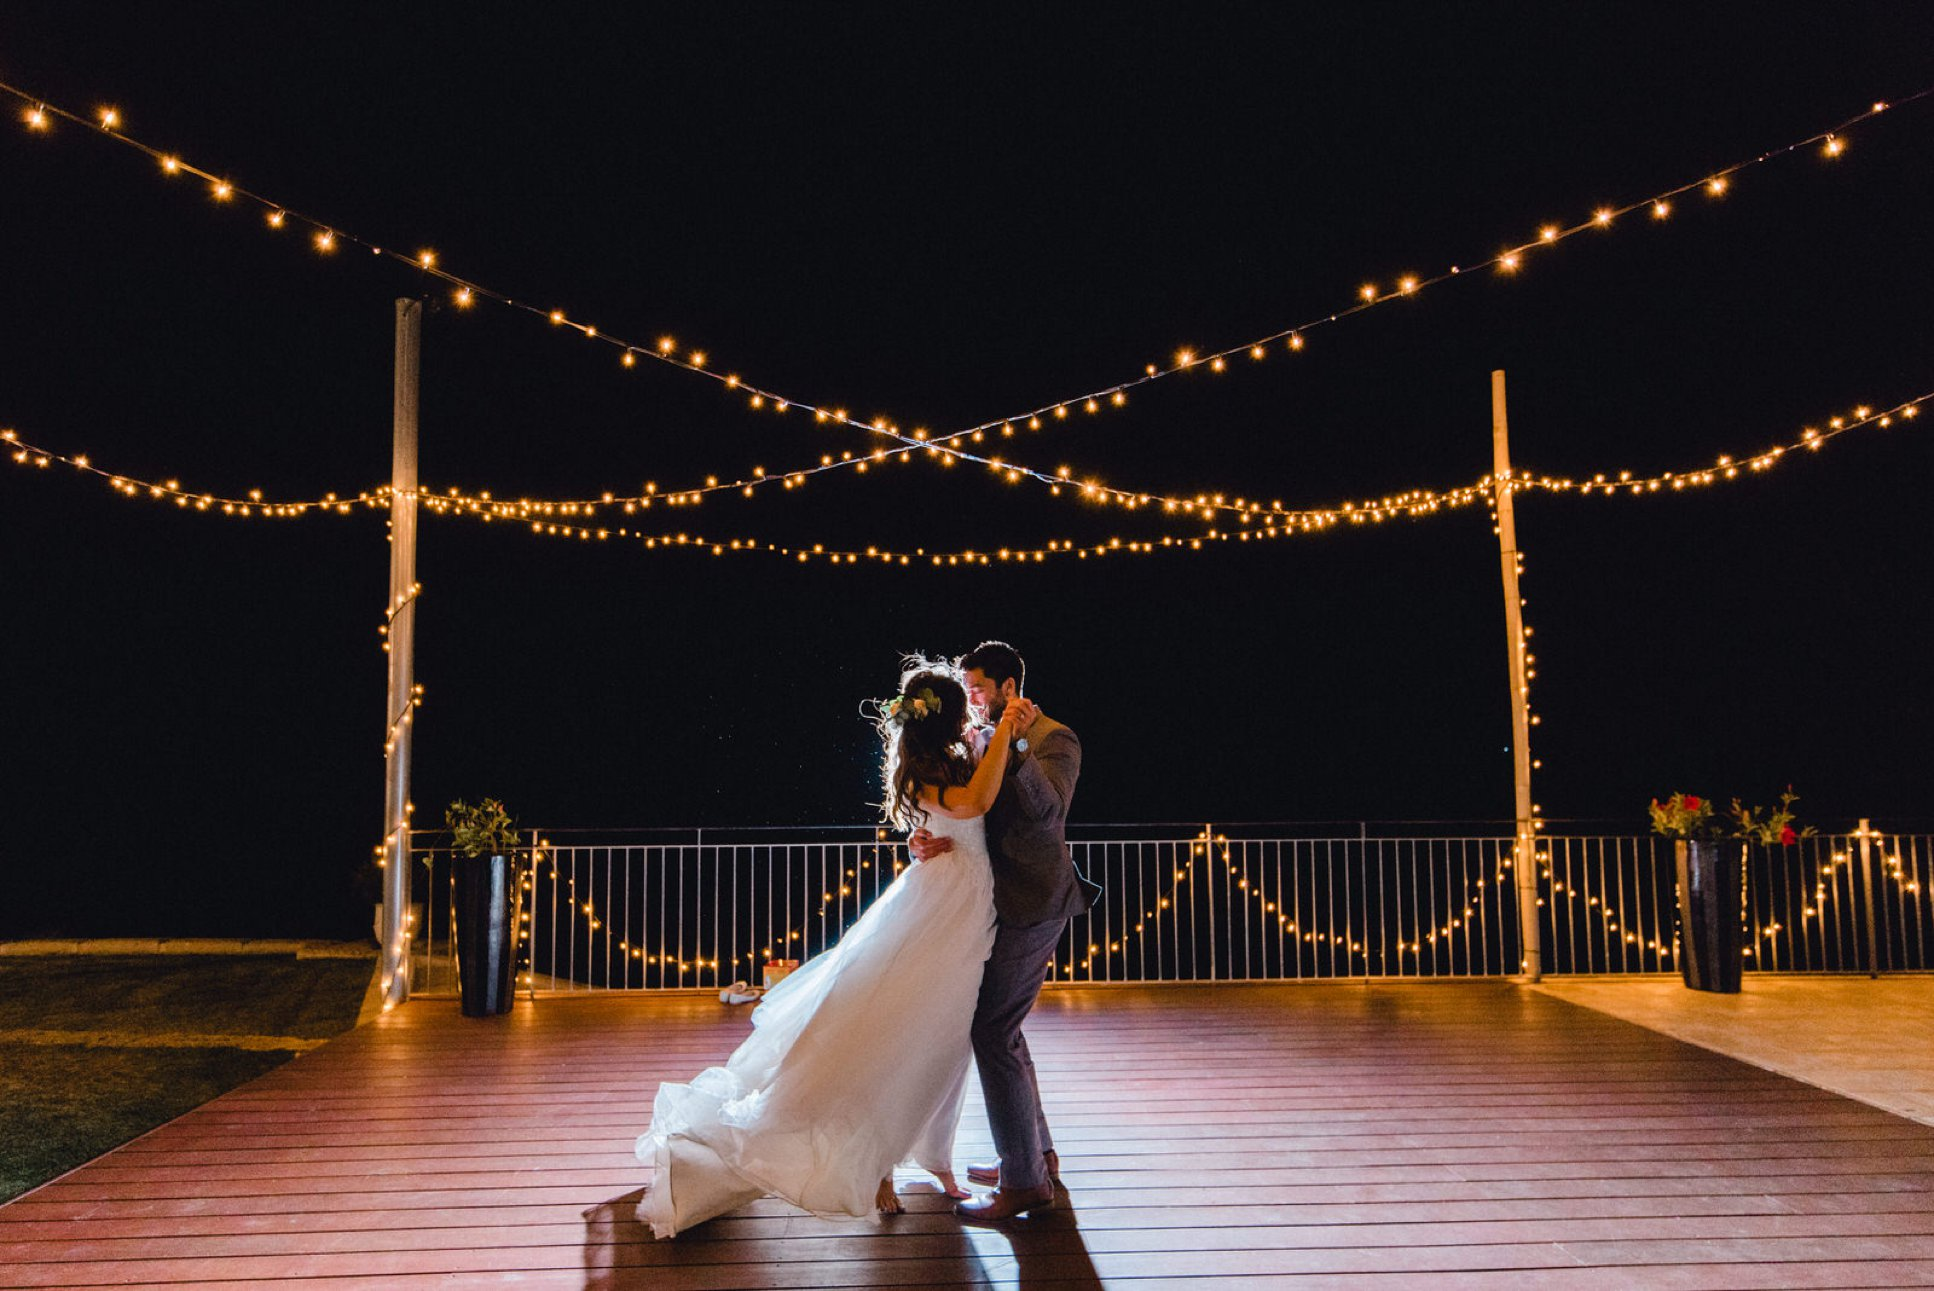 Local Wedding Photographer in Margaret River Region